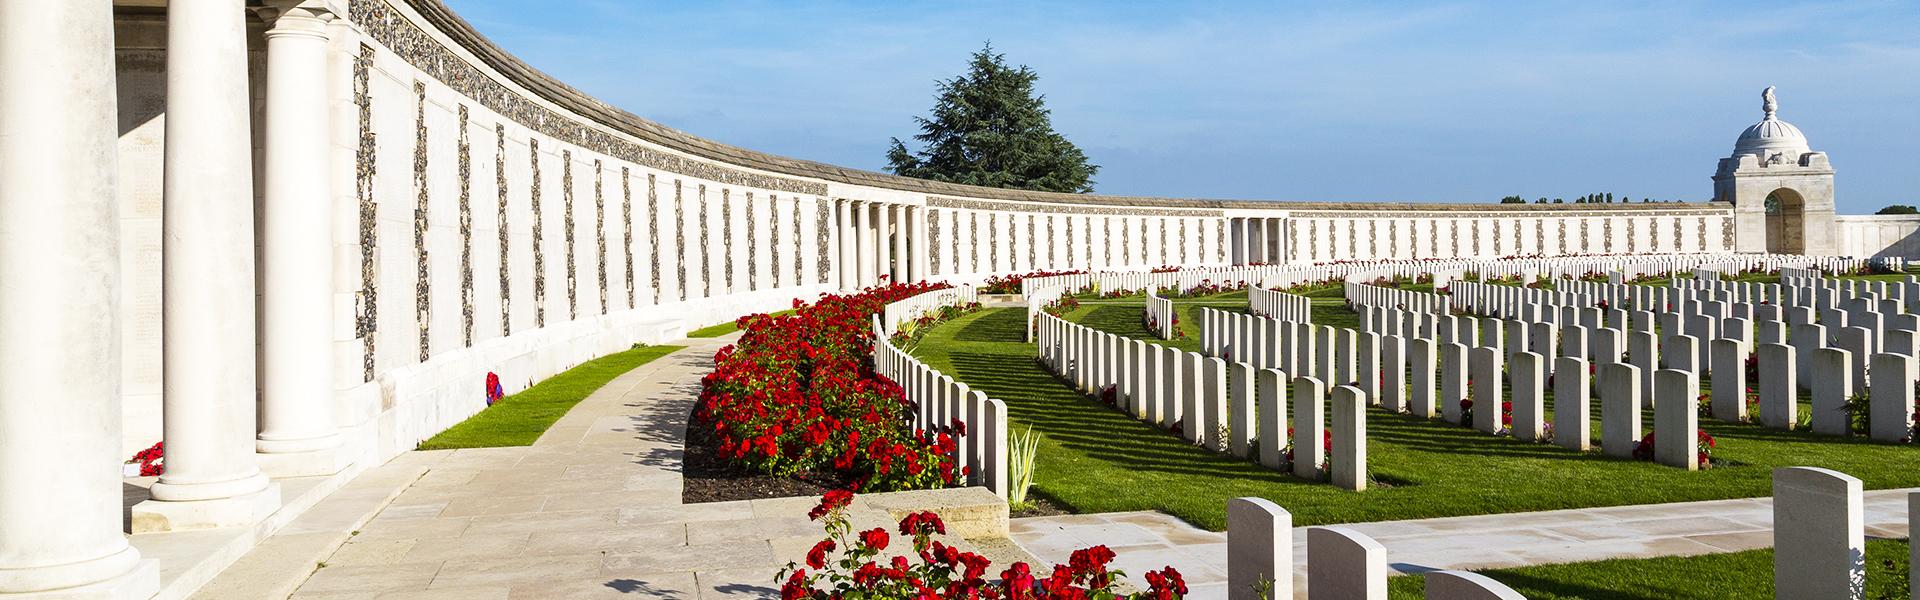 Tyne Cot Cemetery in Flanders Fields